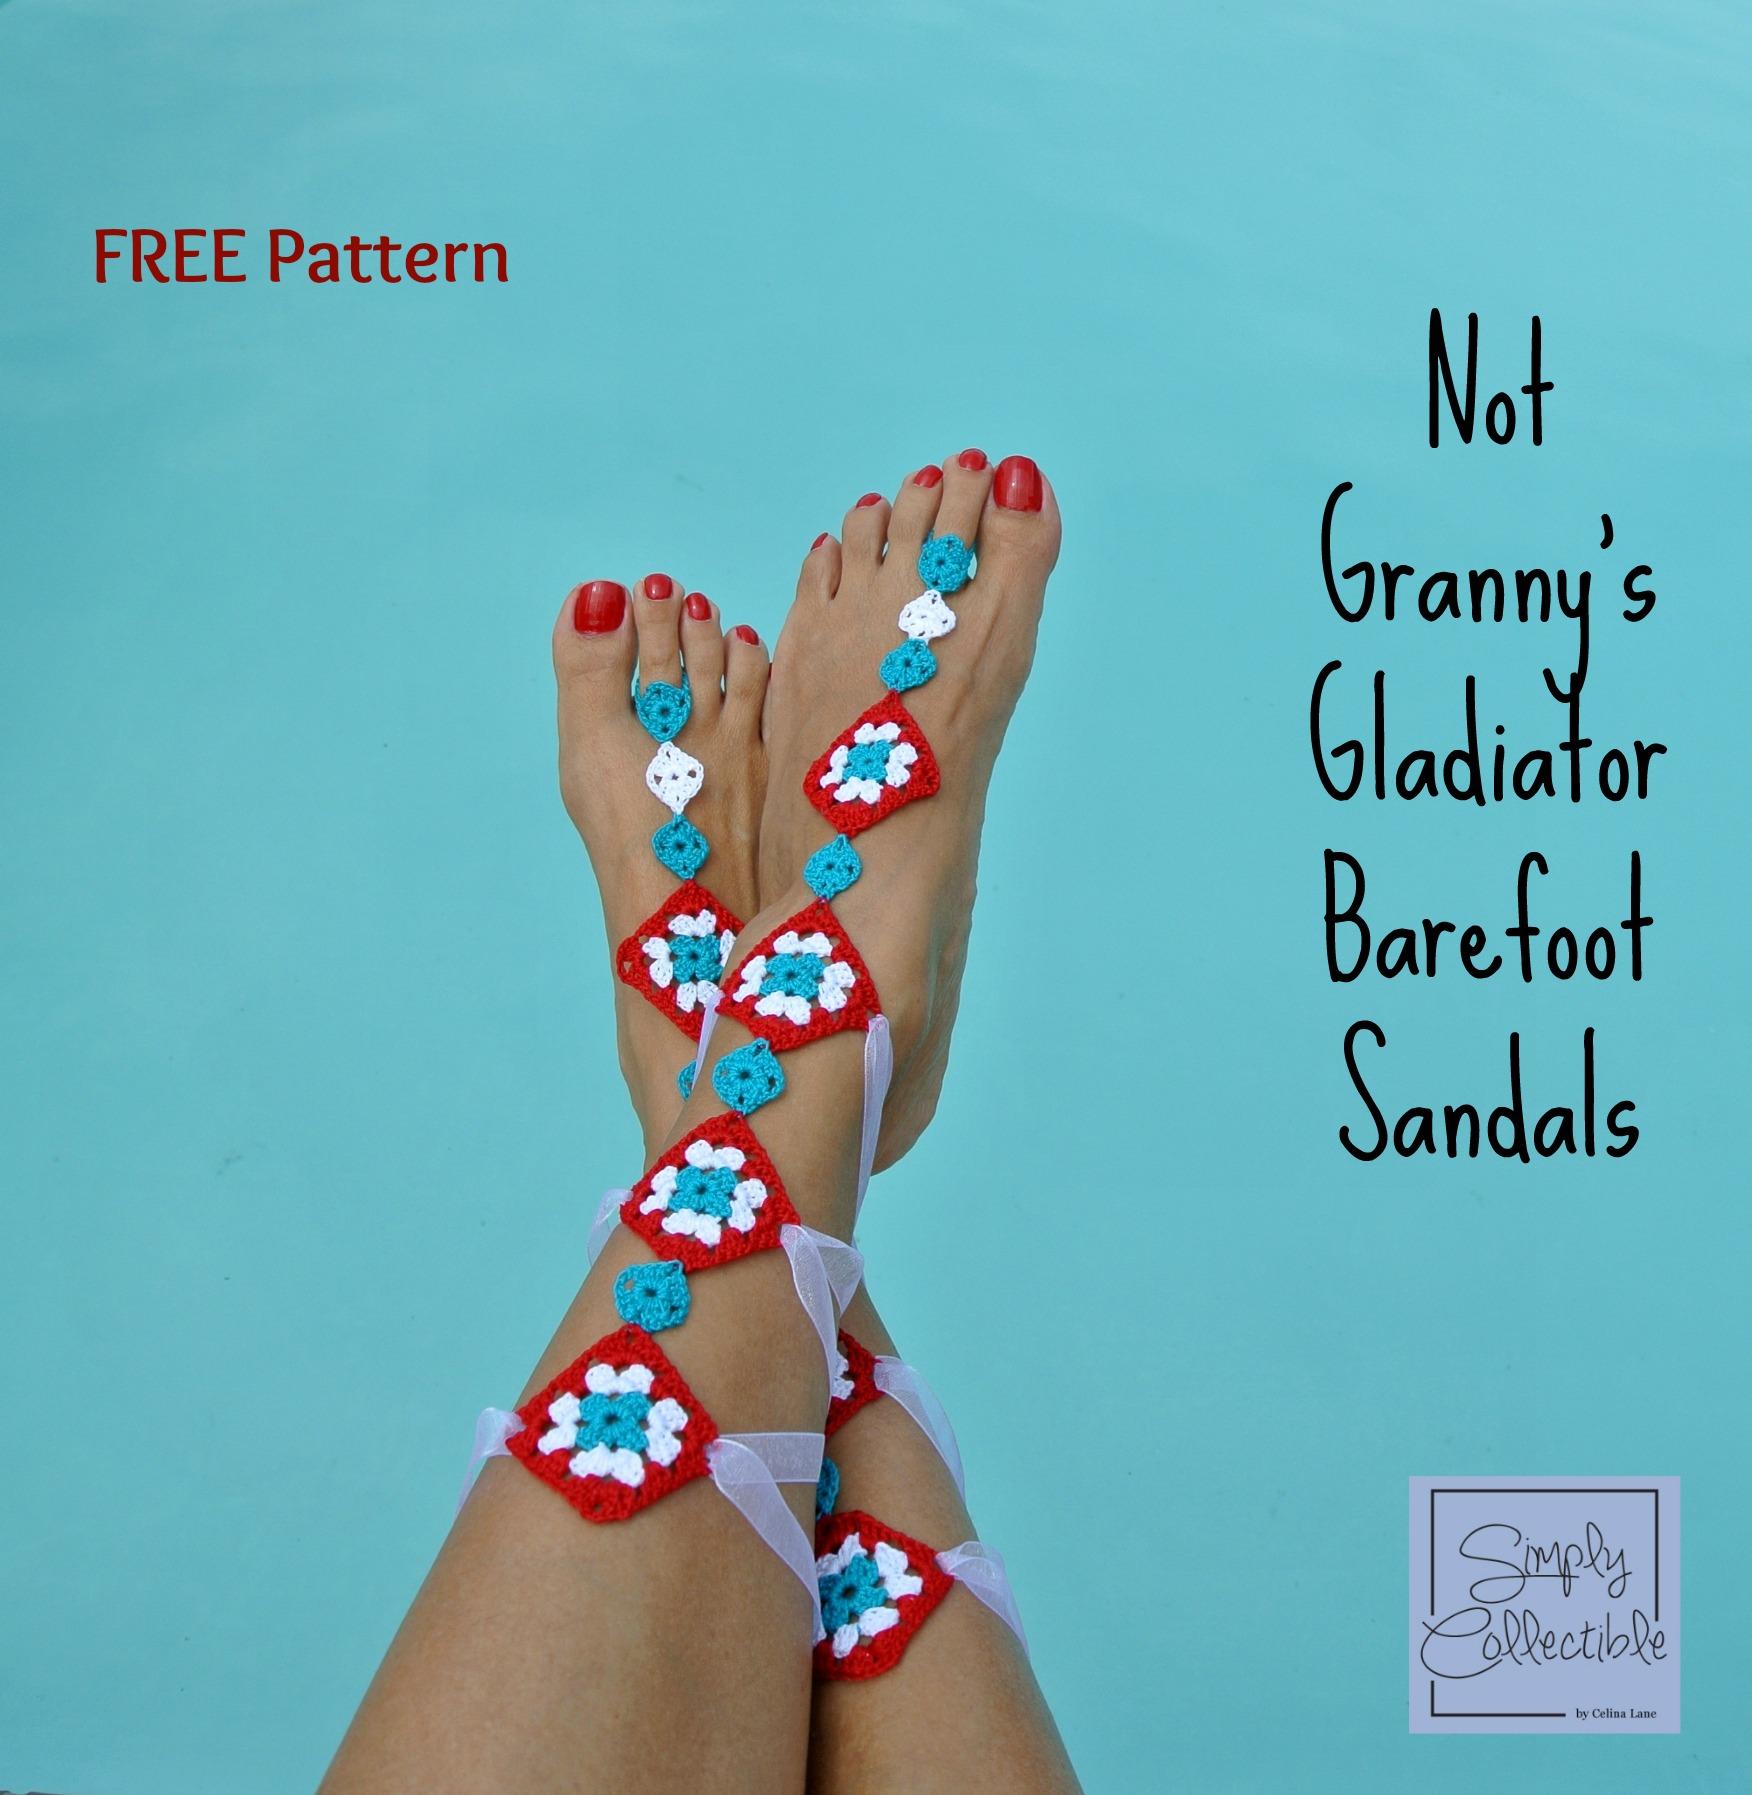 Not Grannys Gladiator Barefoot Sandals